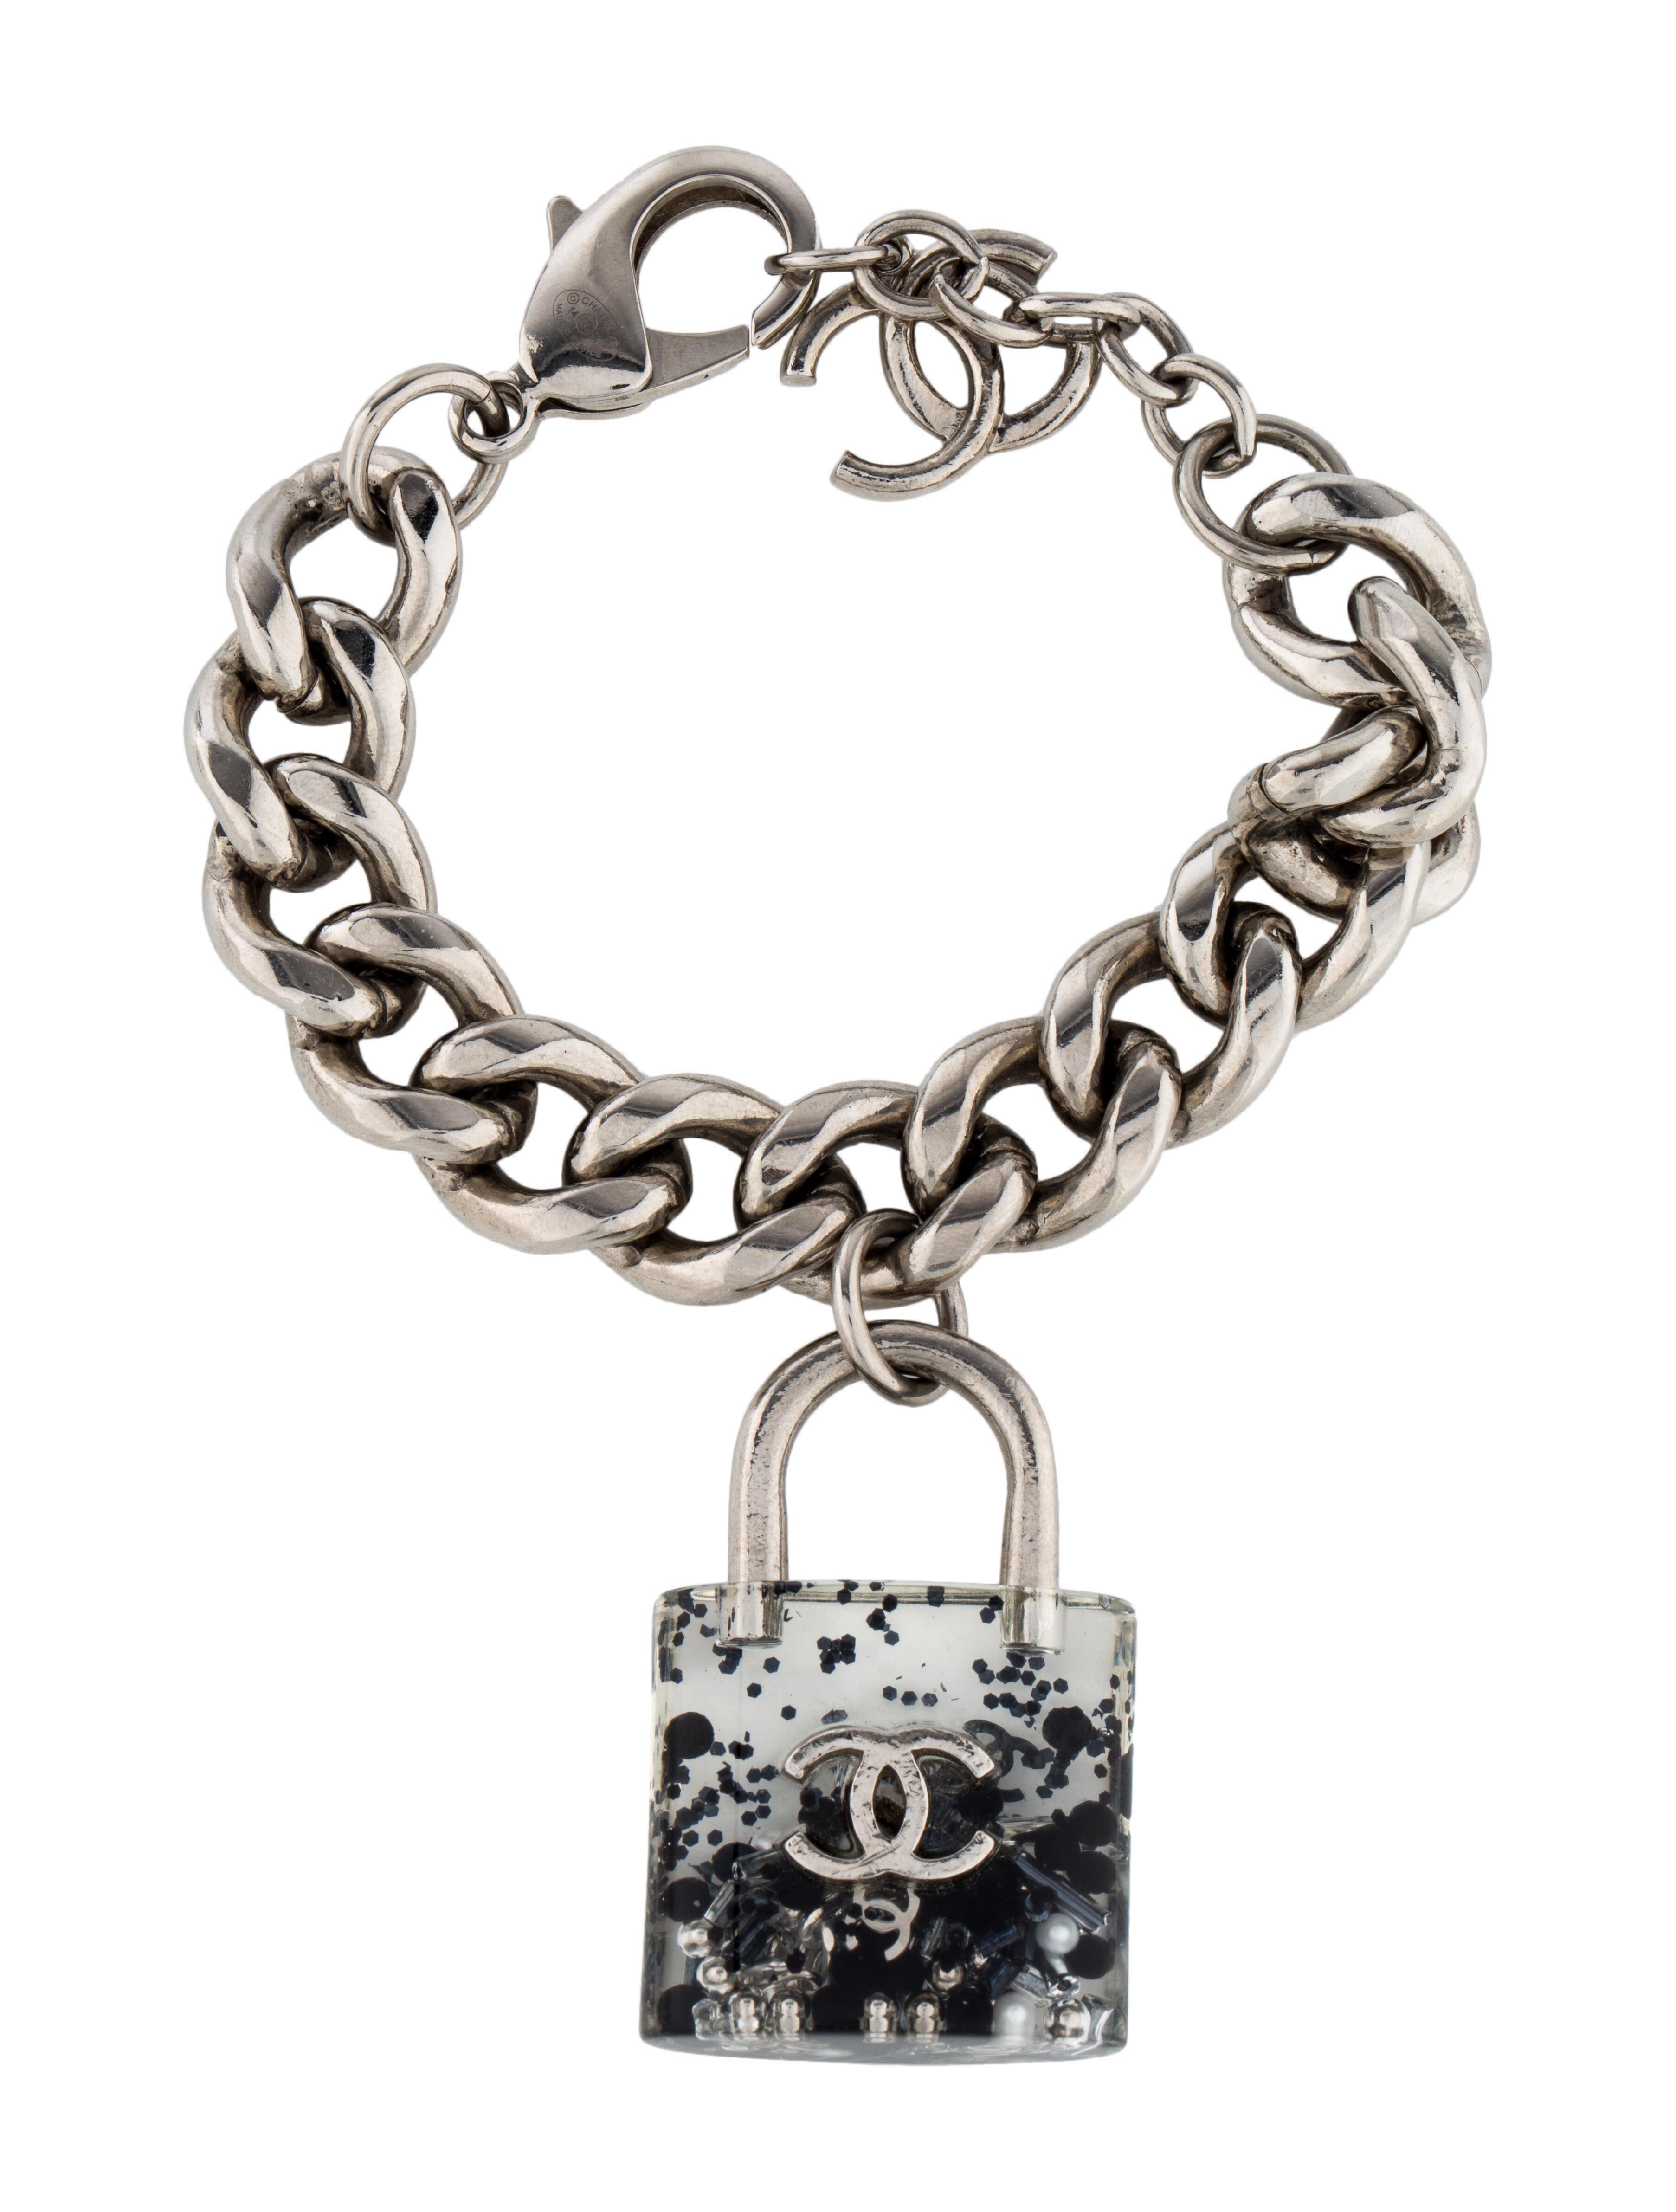 Chanel Resin Cc Lock Charm Bracelet